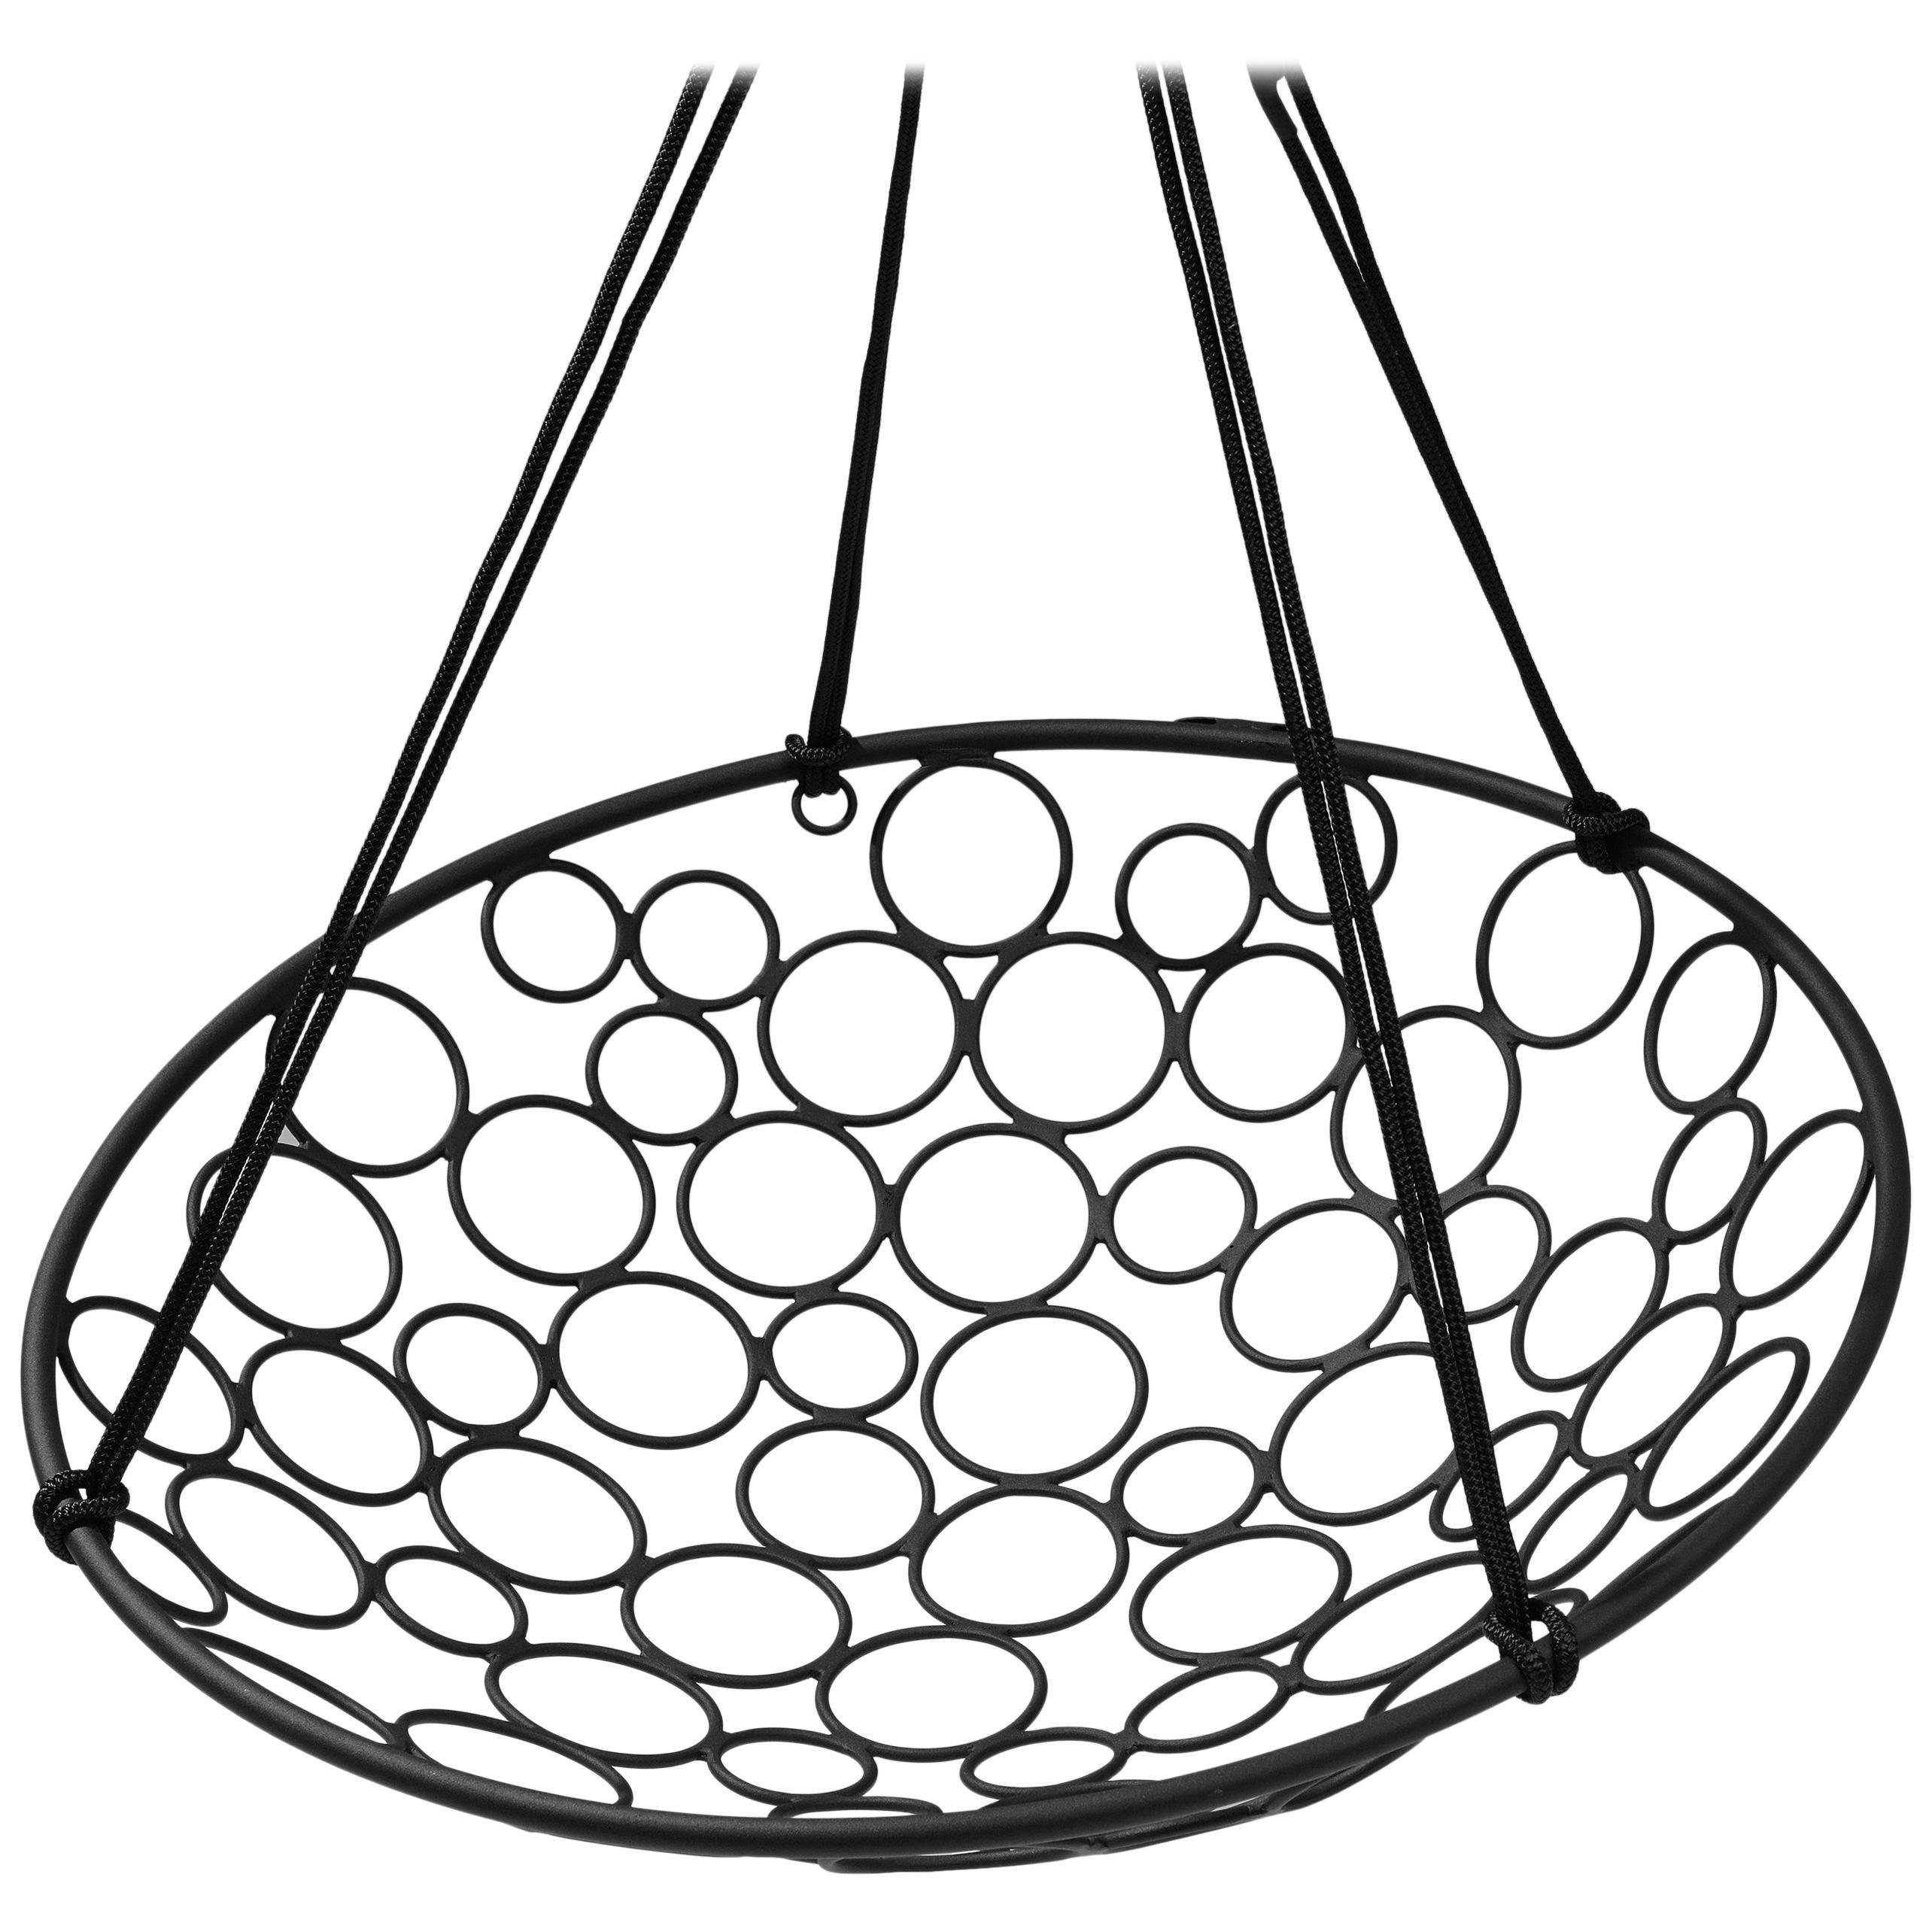 Basket Hanging Swing Chair Modern Steel 21st Century Circle In/Outdoor Black